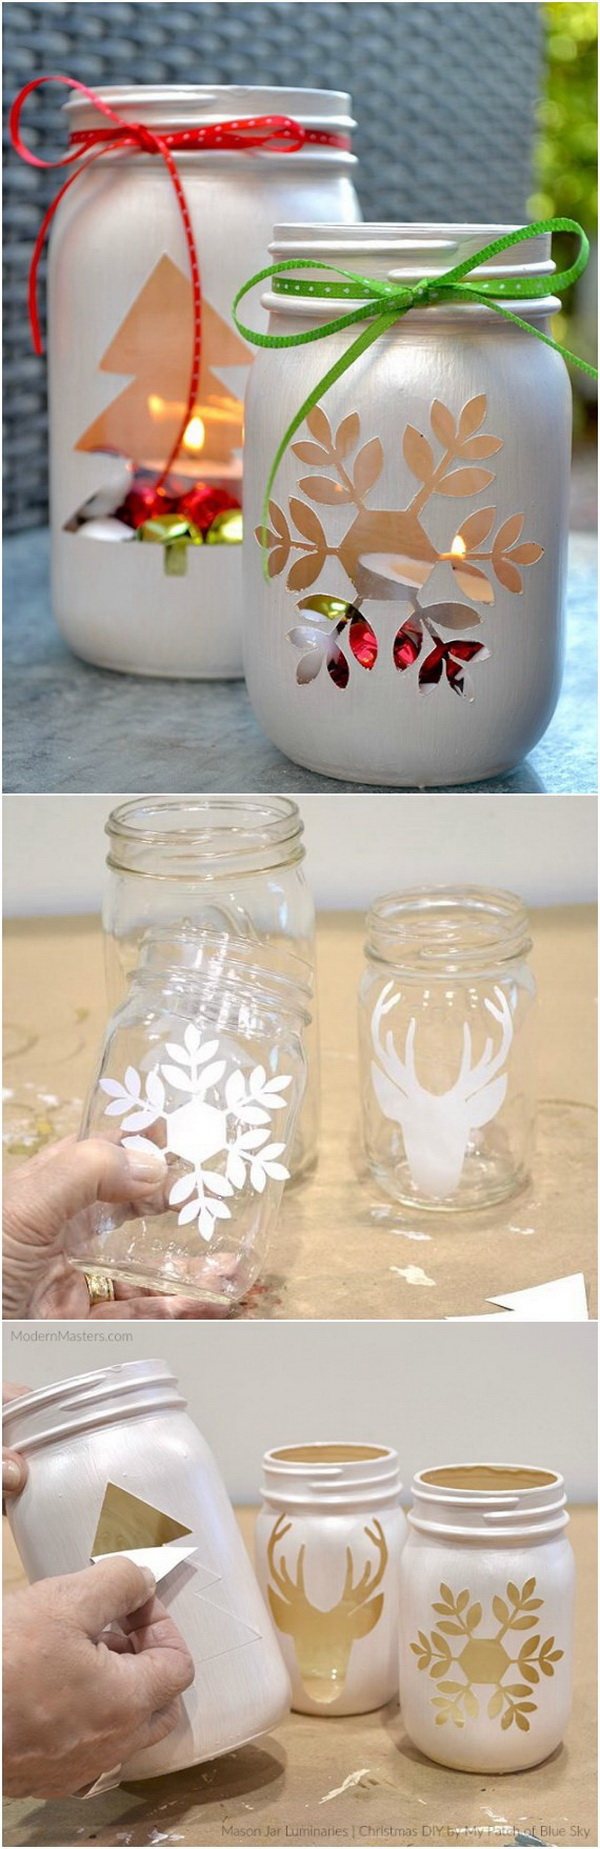 DIY Mason Jar Holiday Luminary.